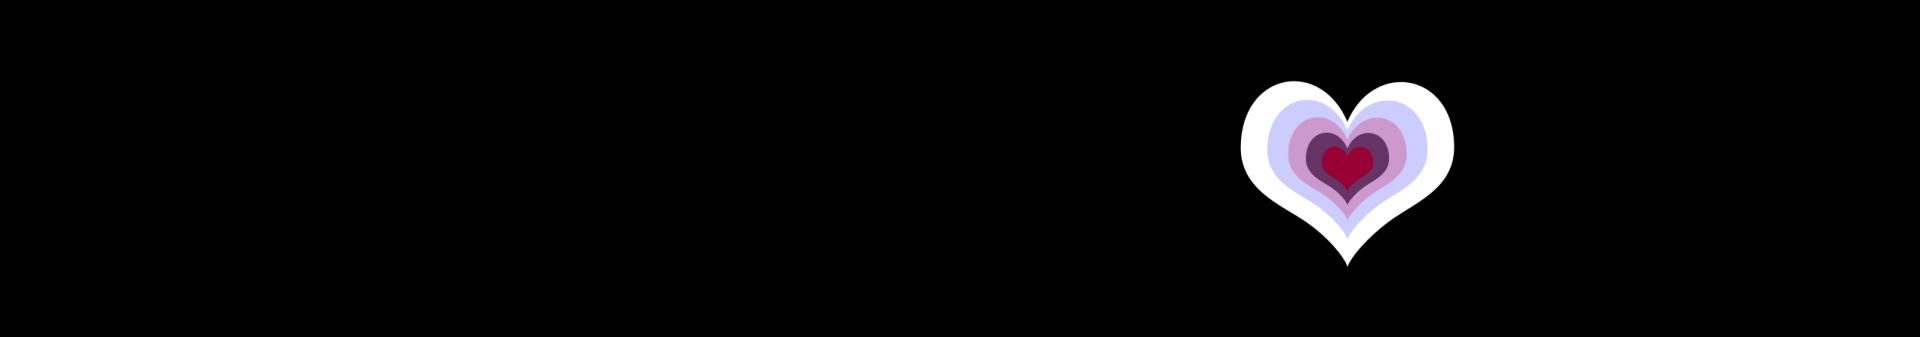 SquareFindPoly4